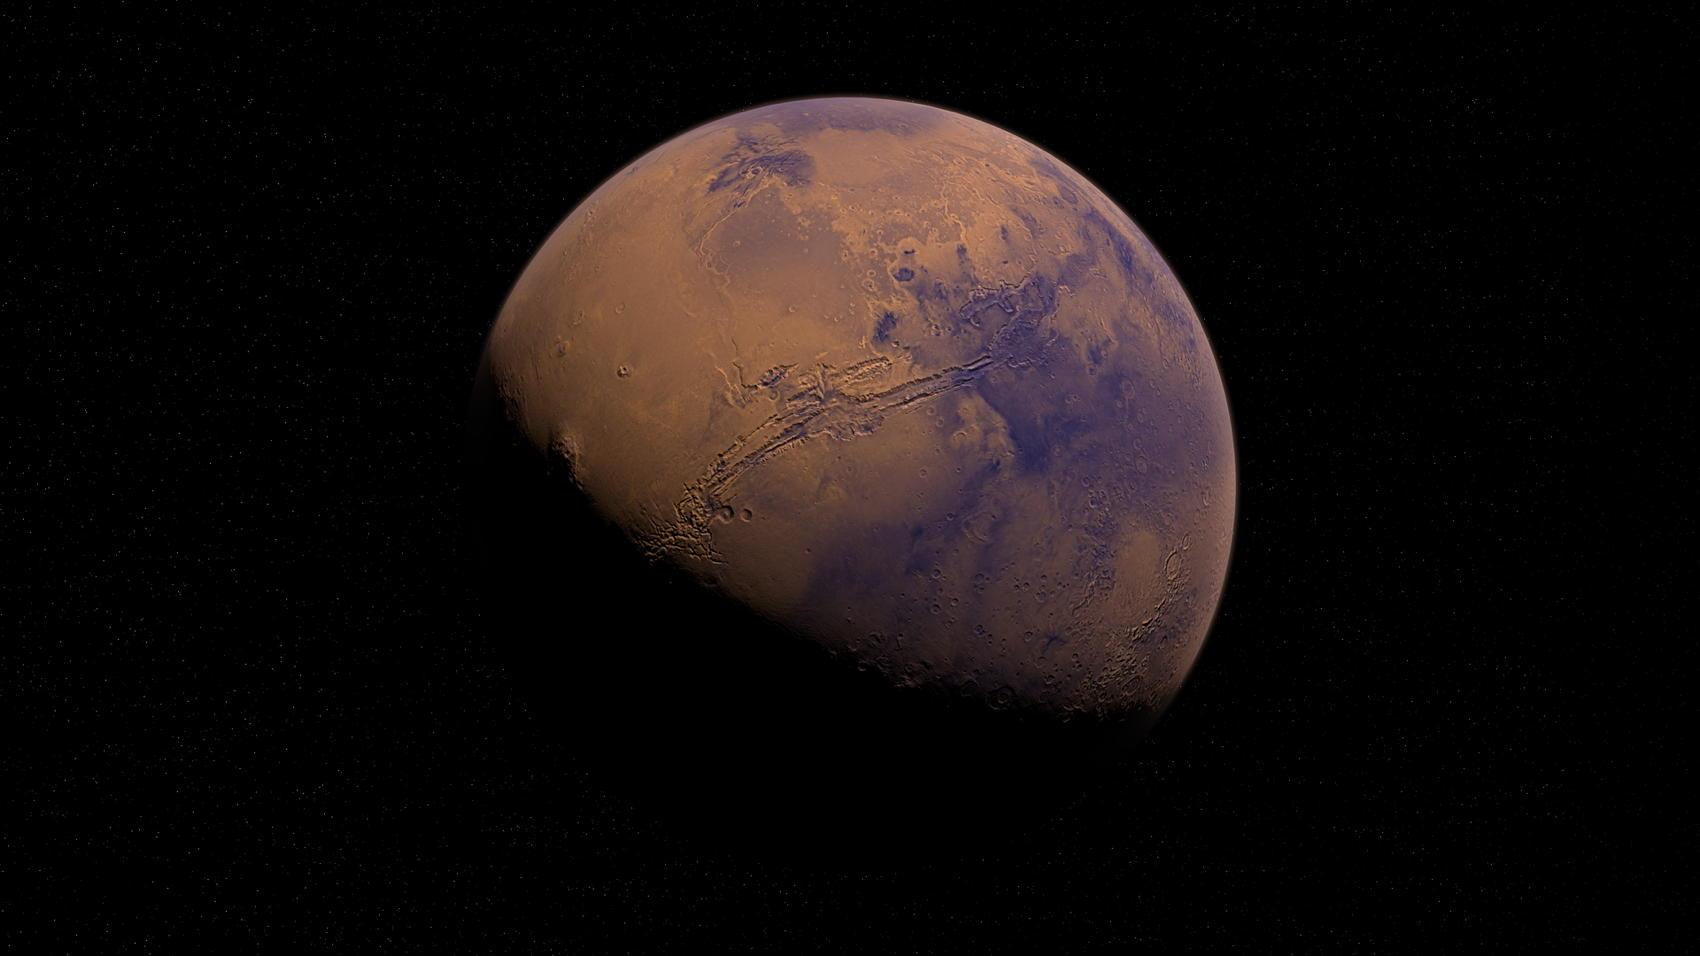 Mars - Image by Alexander Antropov